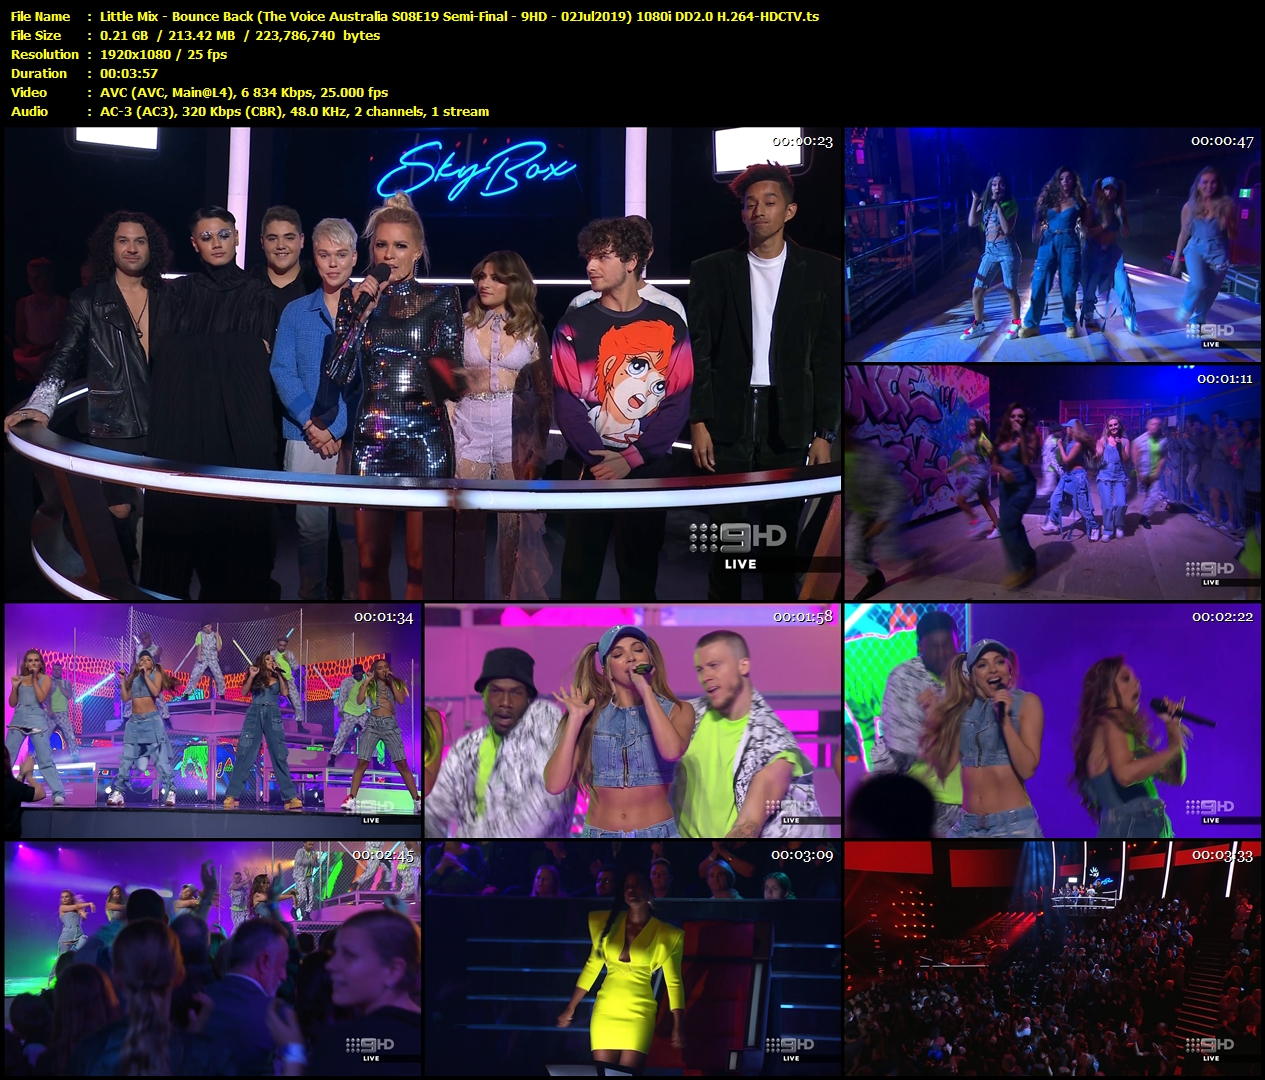 Hdtv Little Mix Bounce Back The Voice Australia S08e19 Semi Final 9hd 02jul2019 1080i Sharemania Us